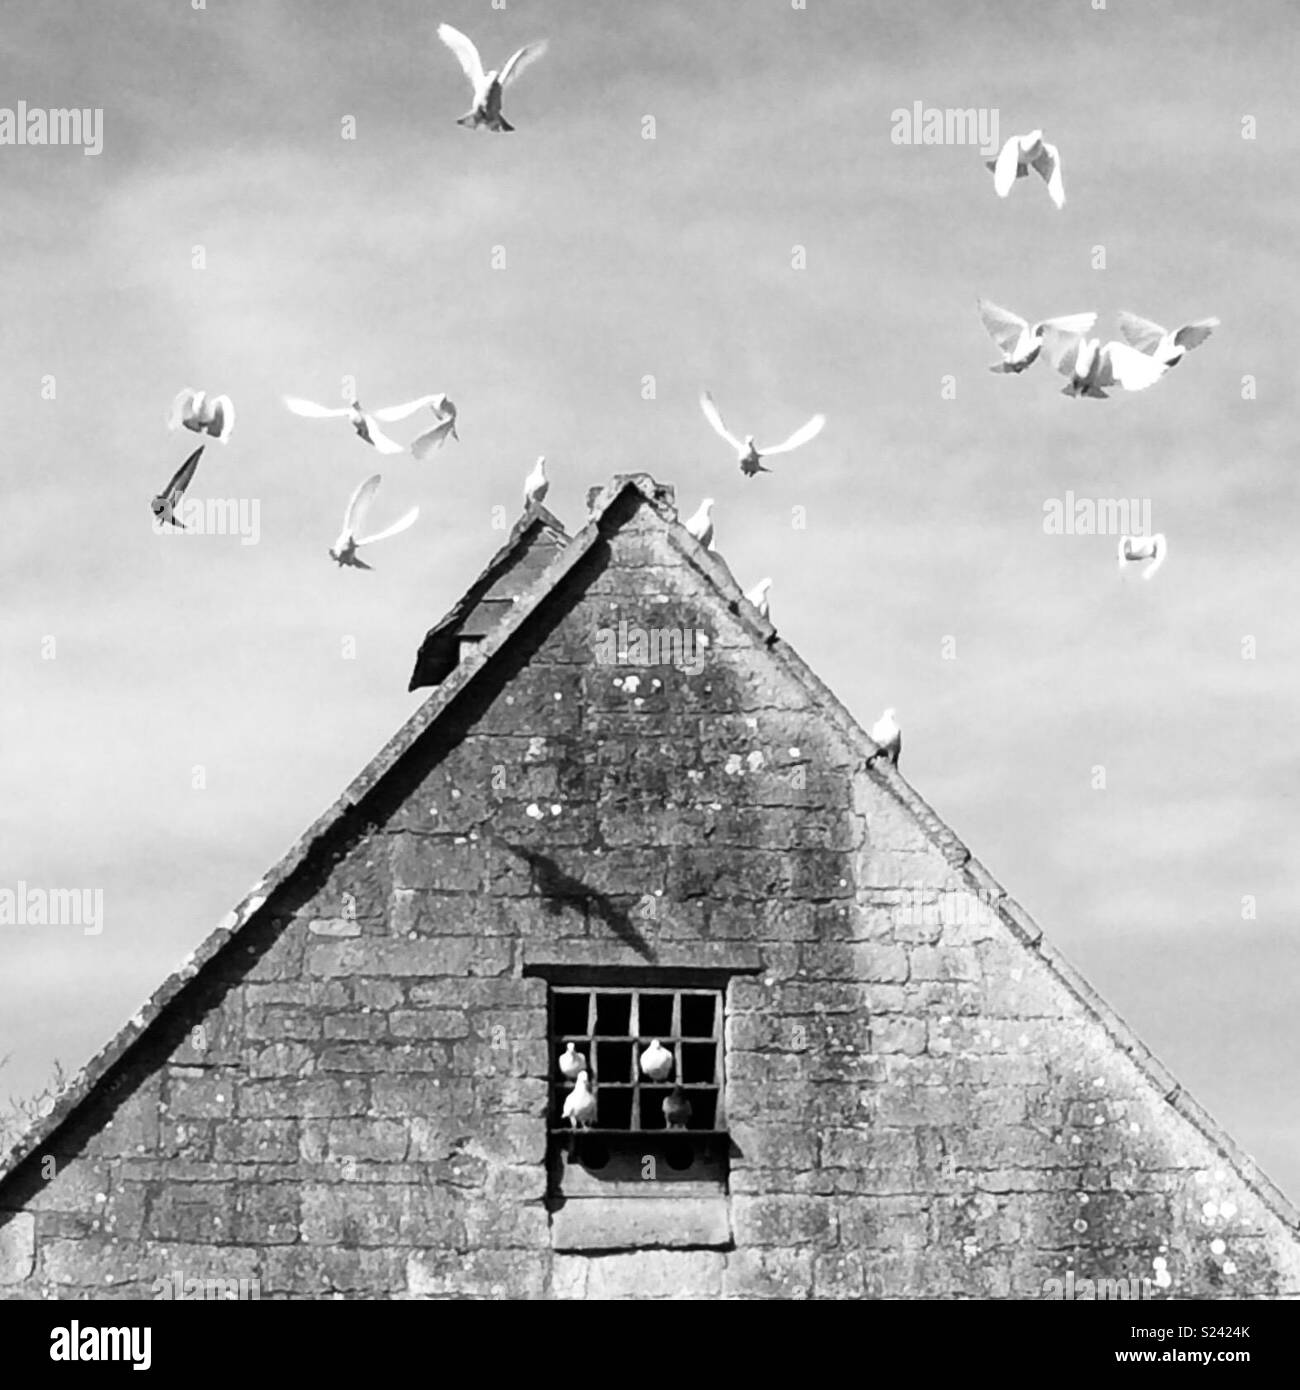 Der Taubenschlag, Snowshill Manor, Gloucestershire. Stockbild